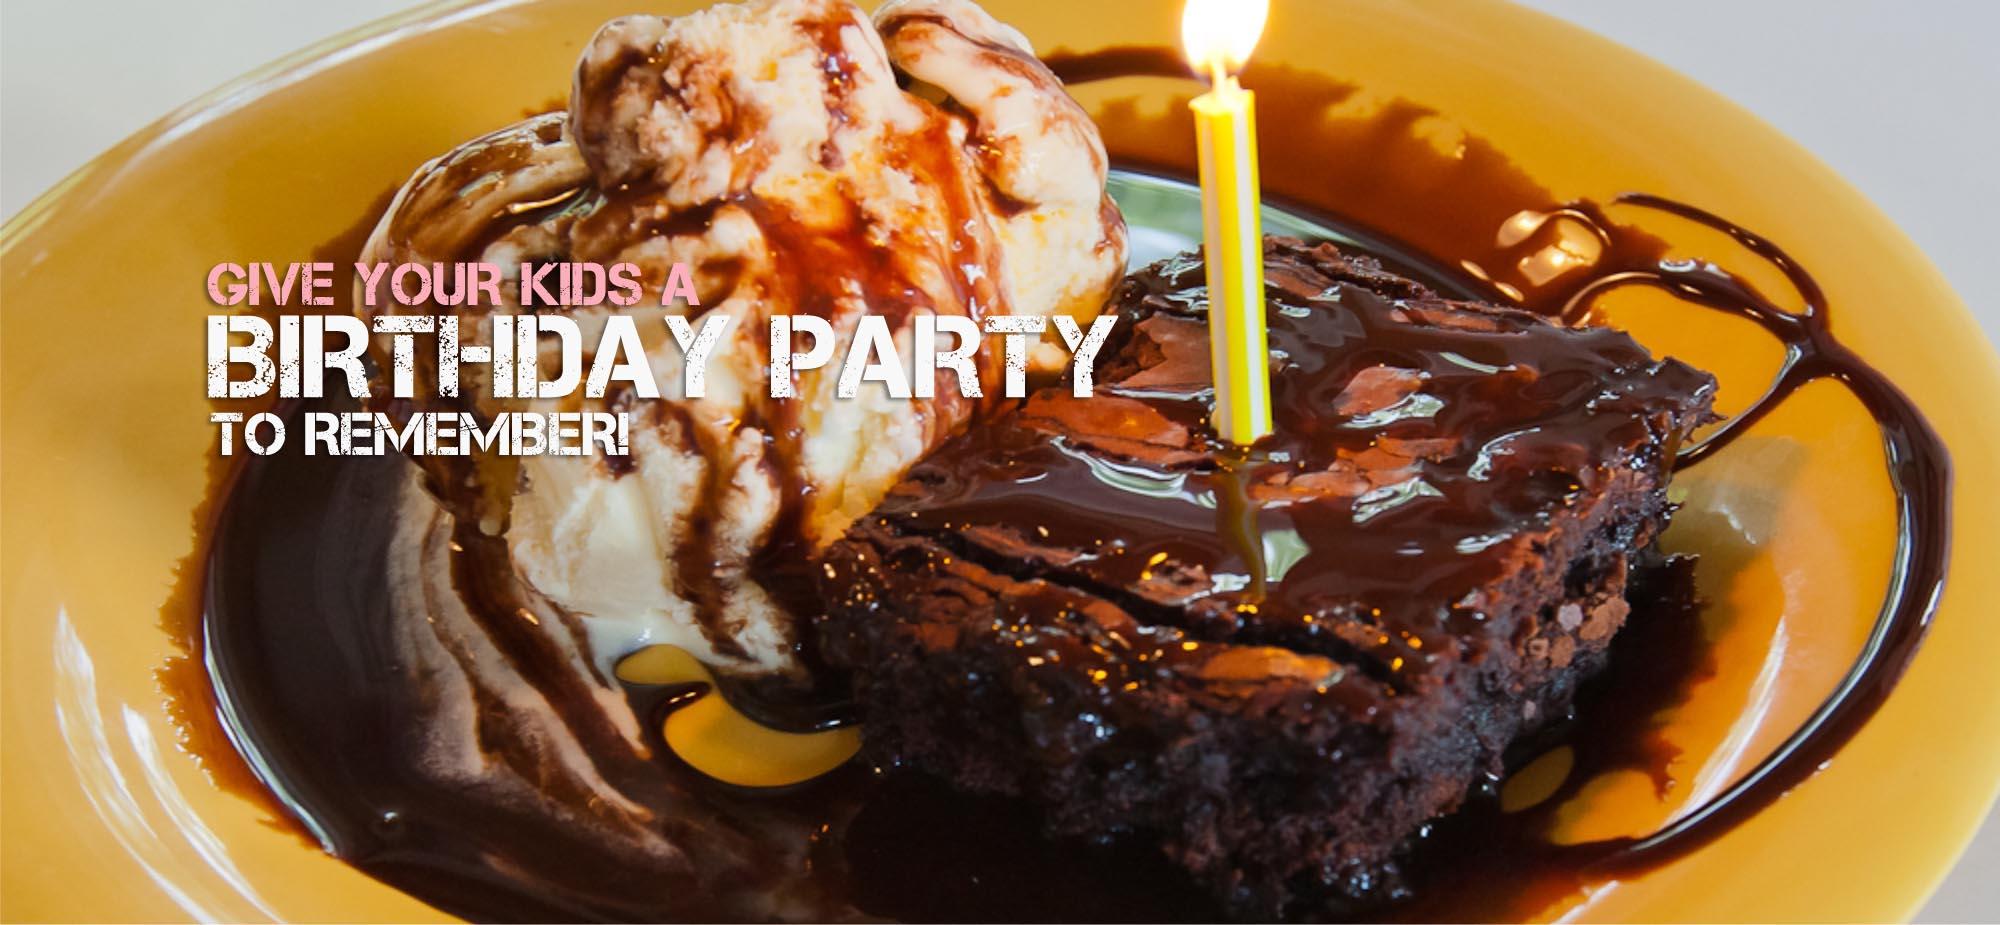 Bloomington Deserts - Birthday Party